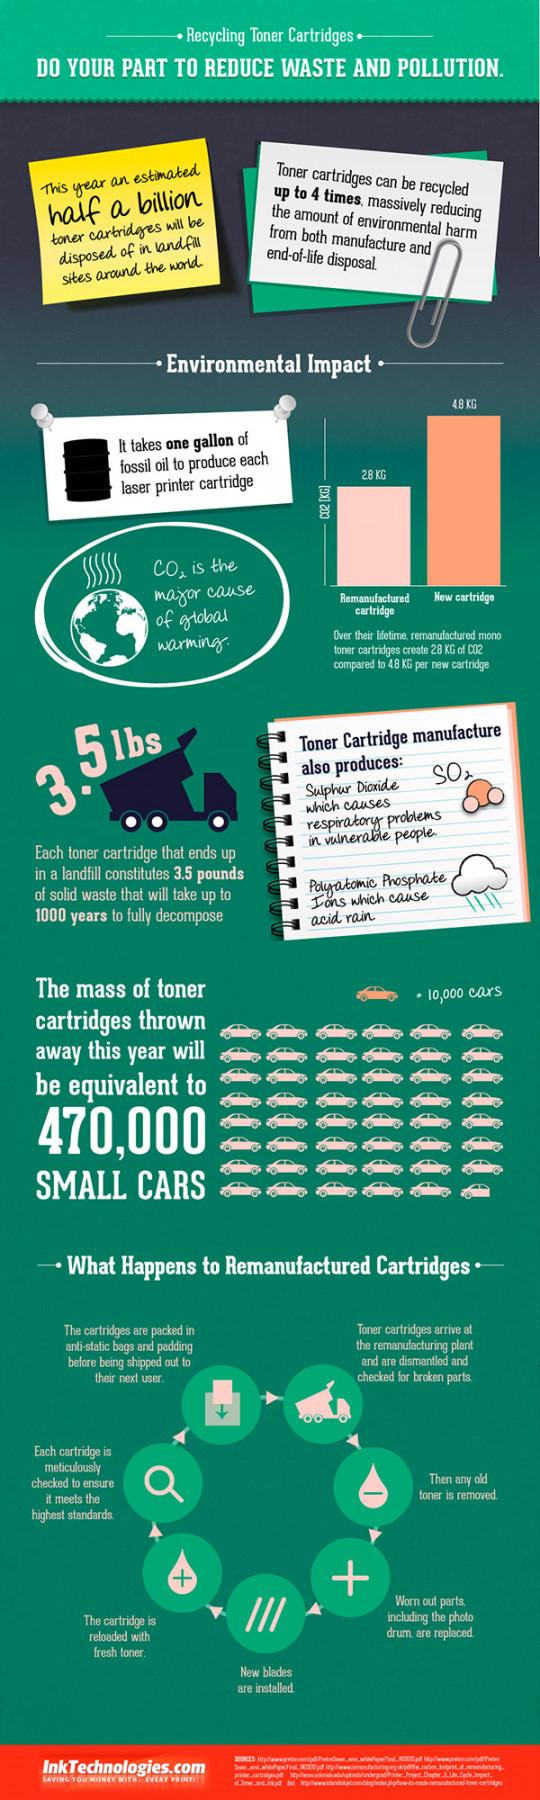 Recycling Toner Cartridges